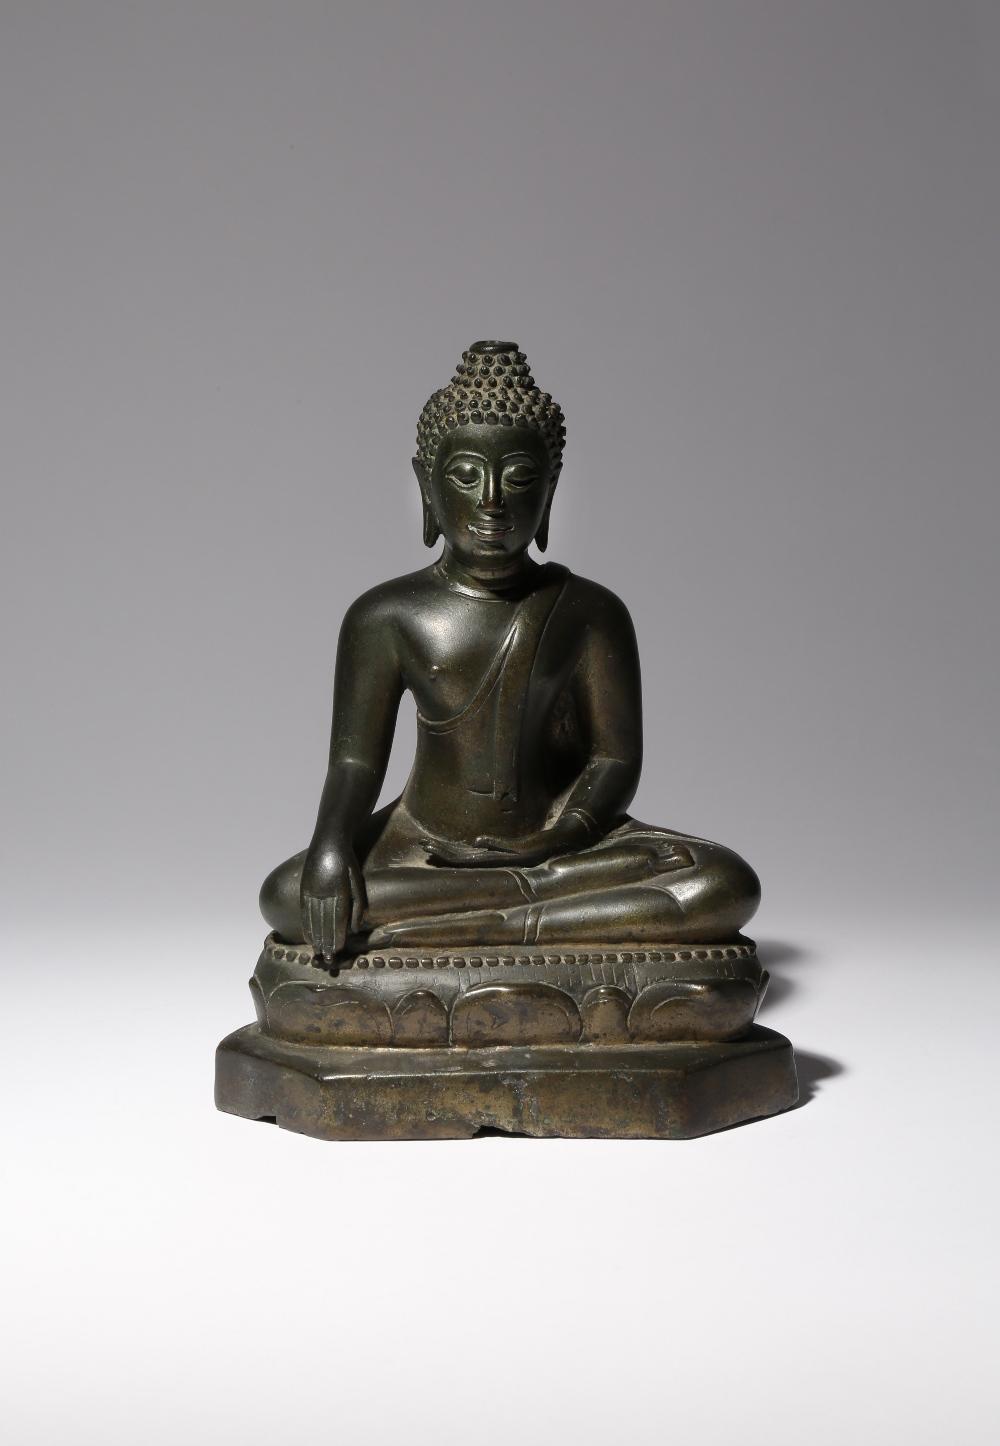 A SOUTHEAST ASIAN BRONZE FIGURE OF BUDDHA SHAKYAMUNI 19TH CENTURY He sits upon a beaded lotus throne